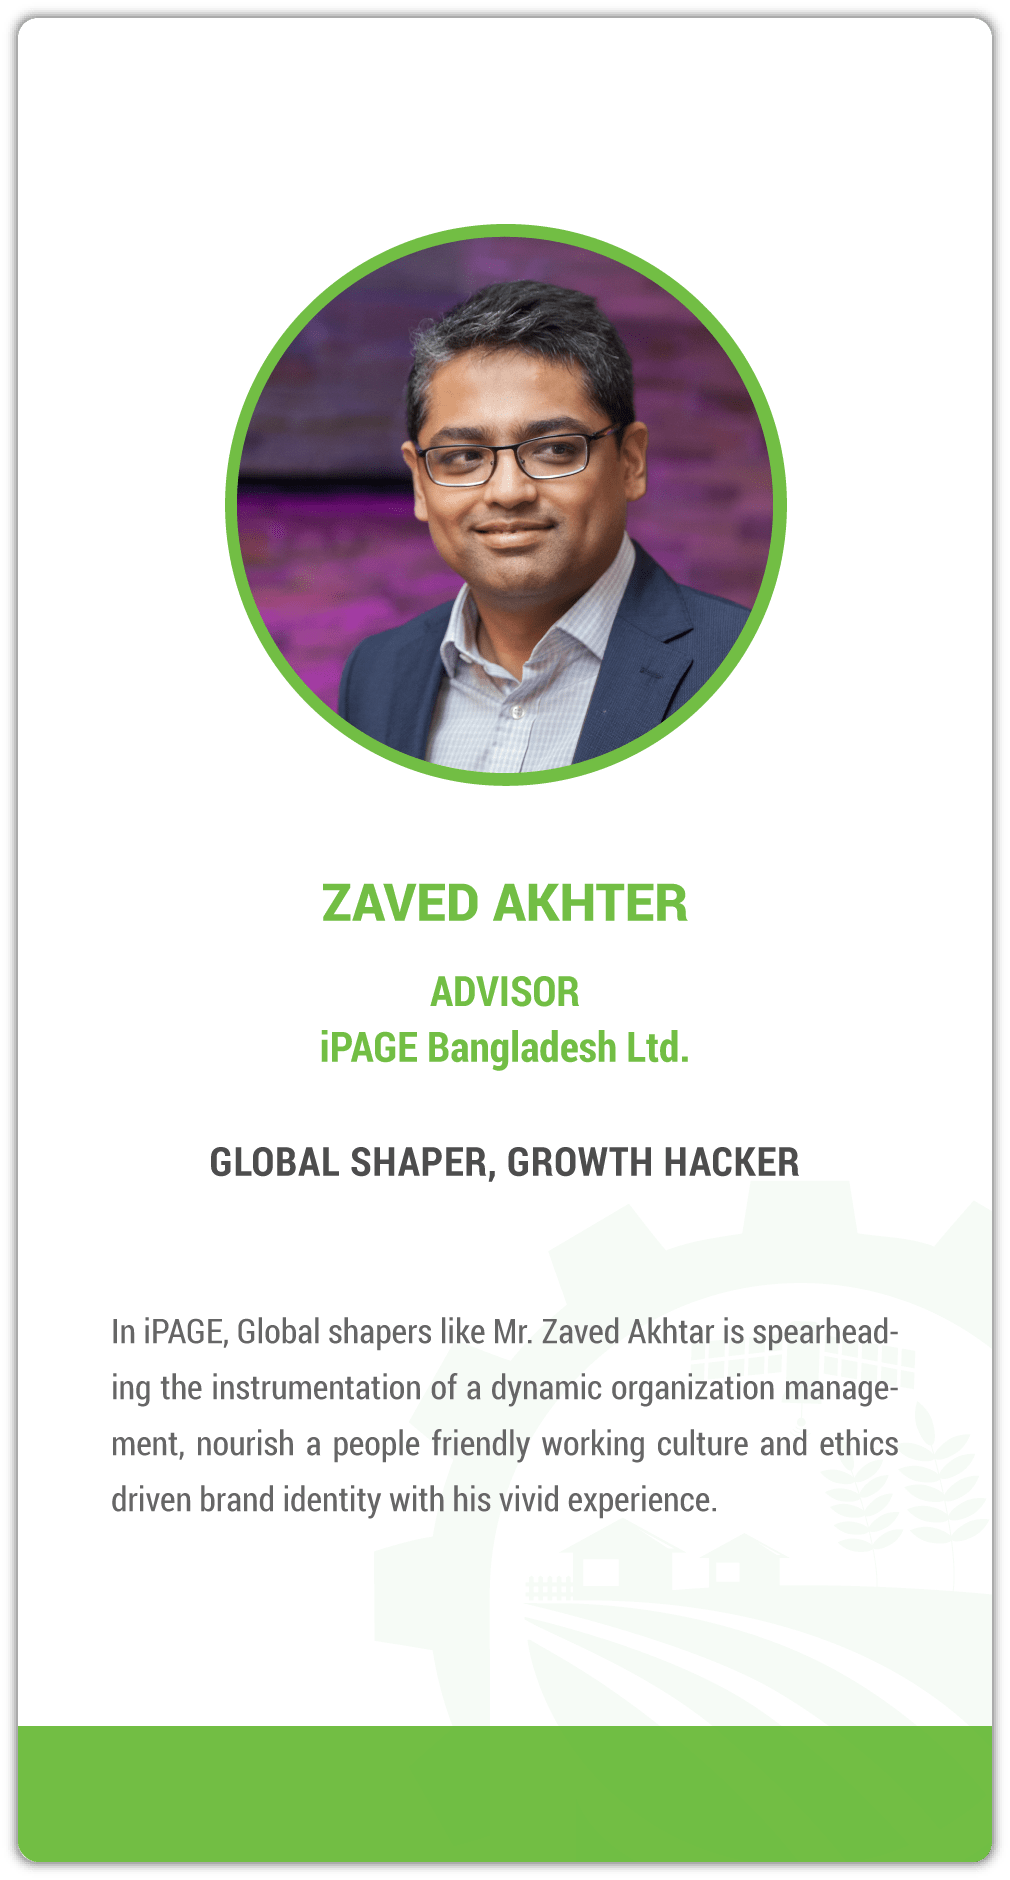 Zaved Akhter